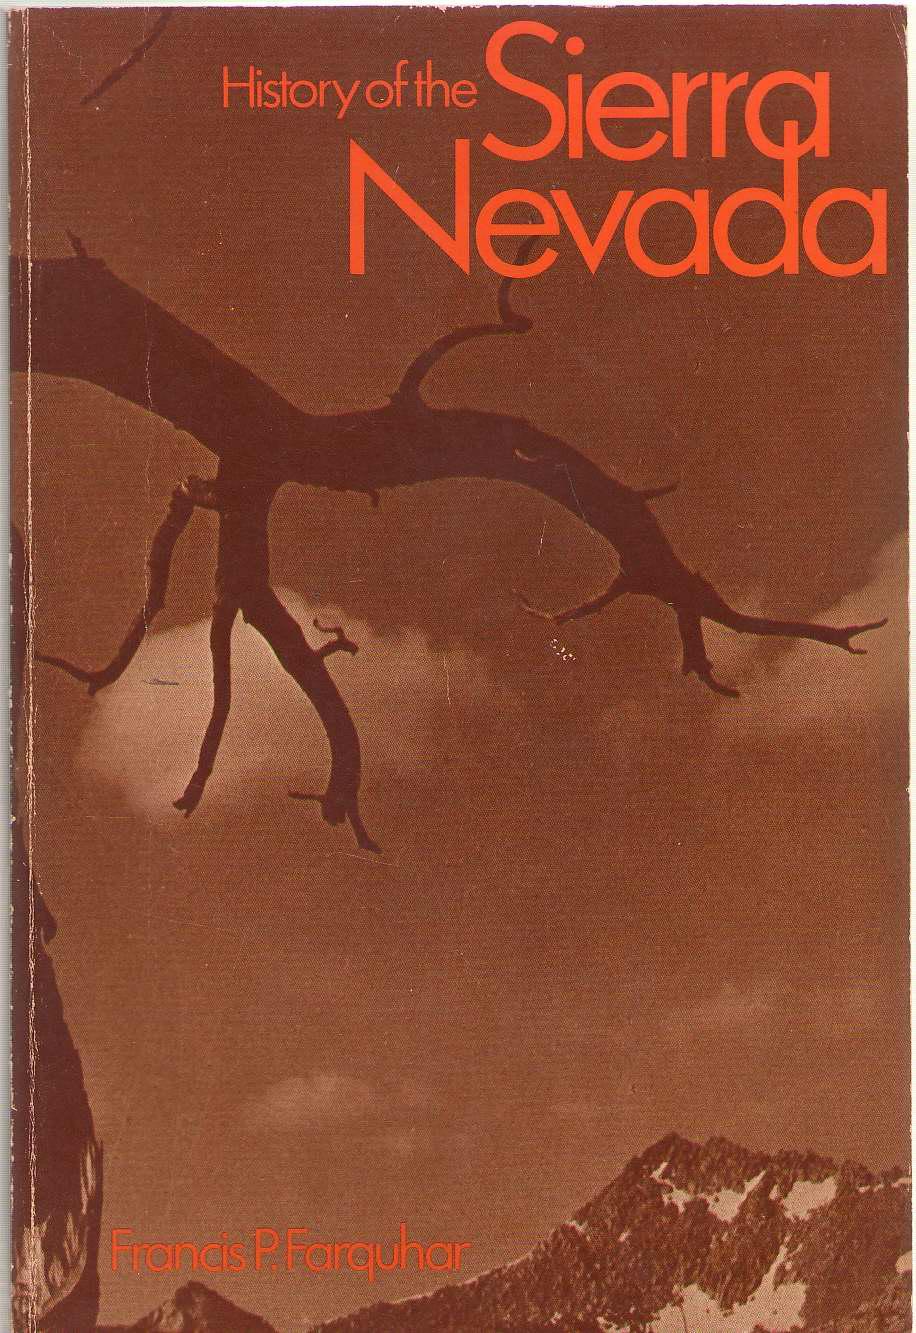 History of the Sierra Nevada, Farquhar, Francis P.